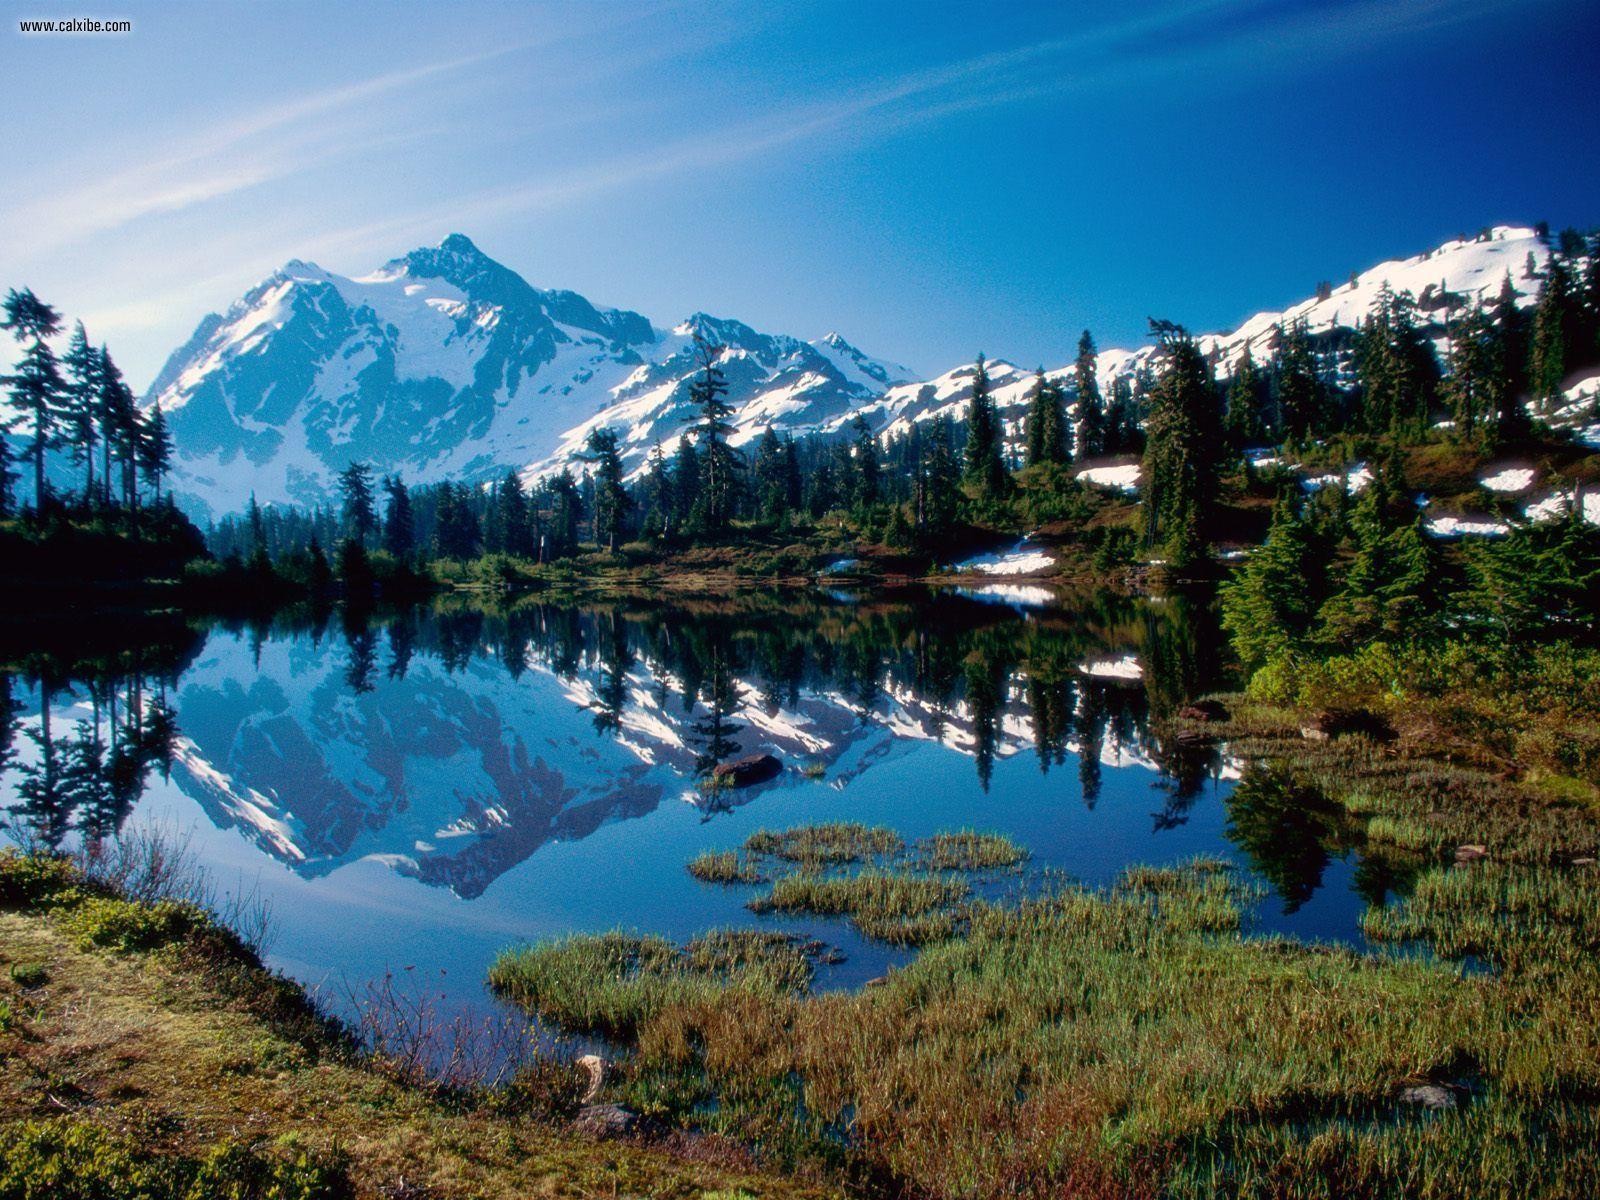 Nature Mount Shuksan North Cascades National Park Washington 1600x1200